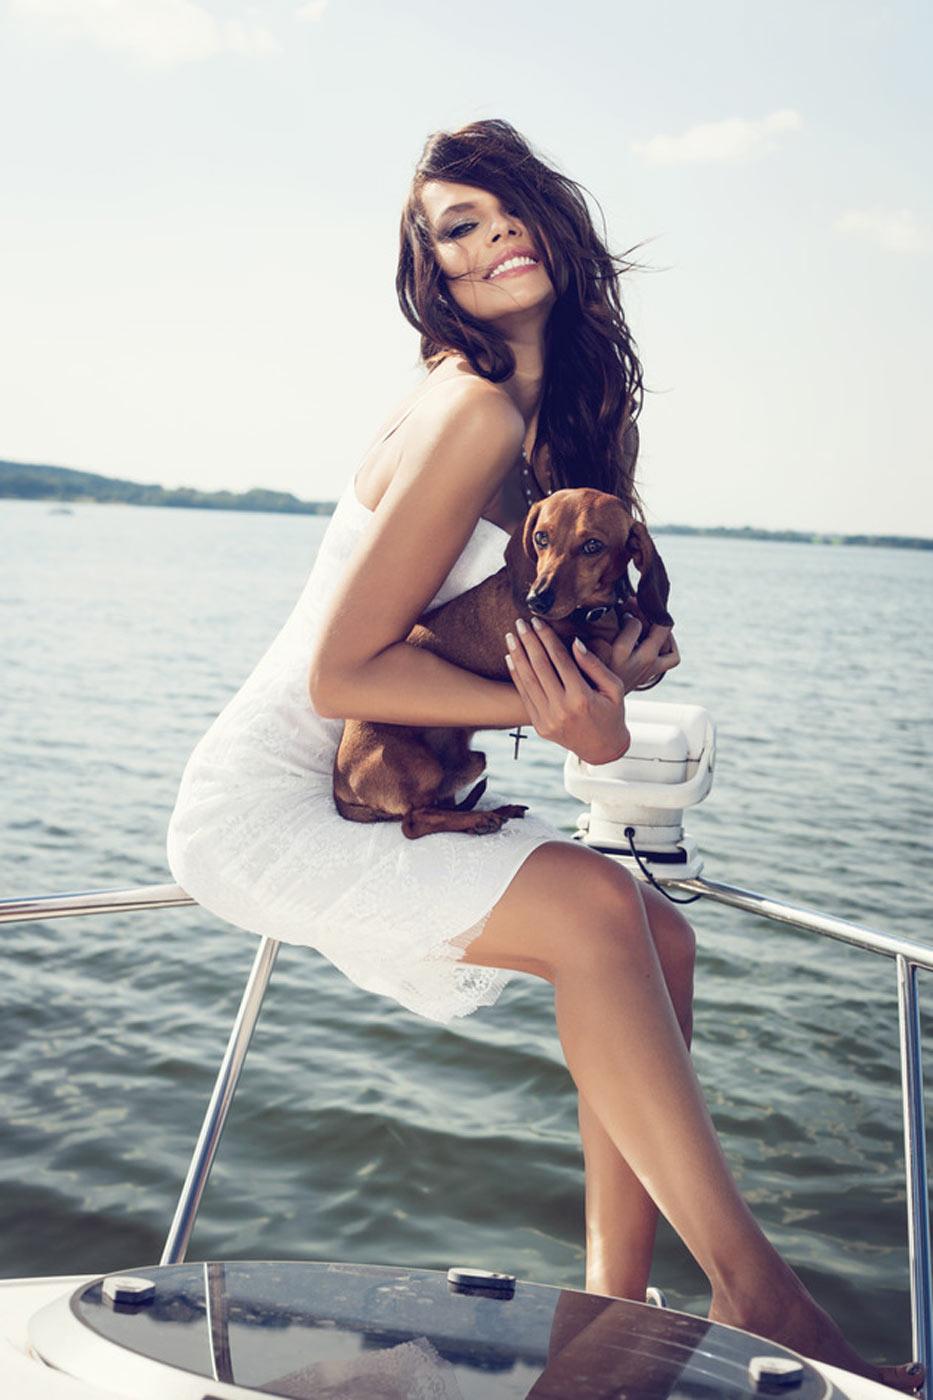 photodune-5616440-happy-woman-smiling-on-boat-s